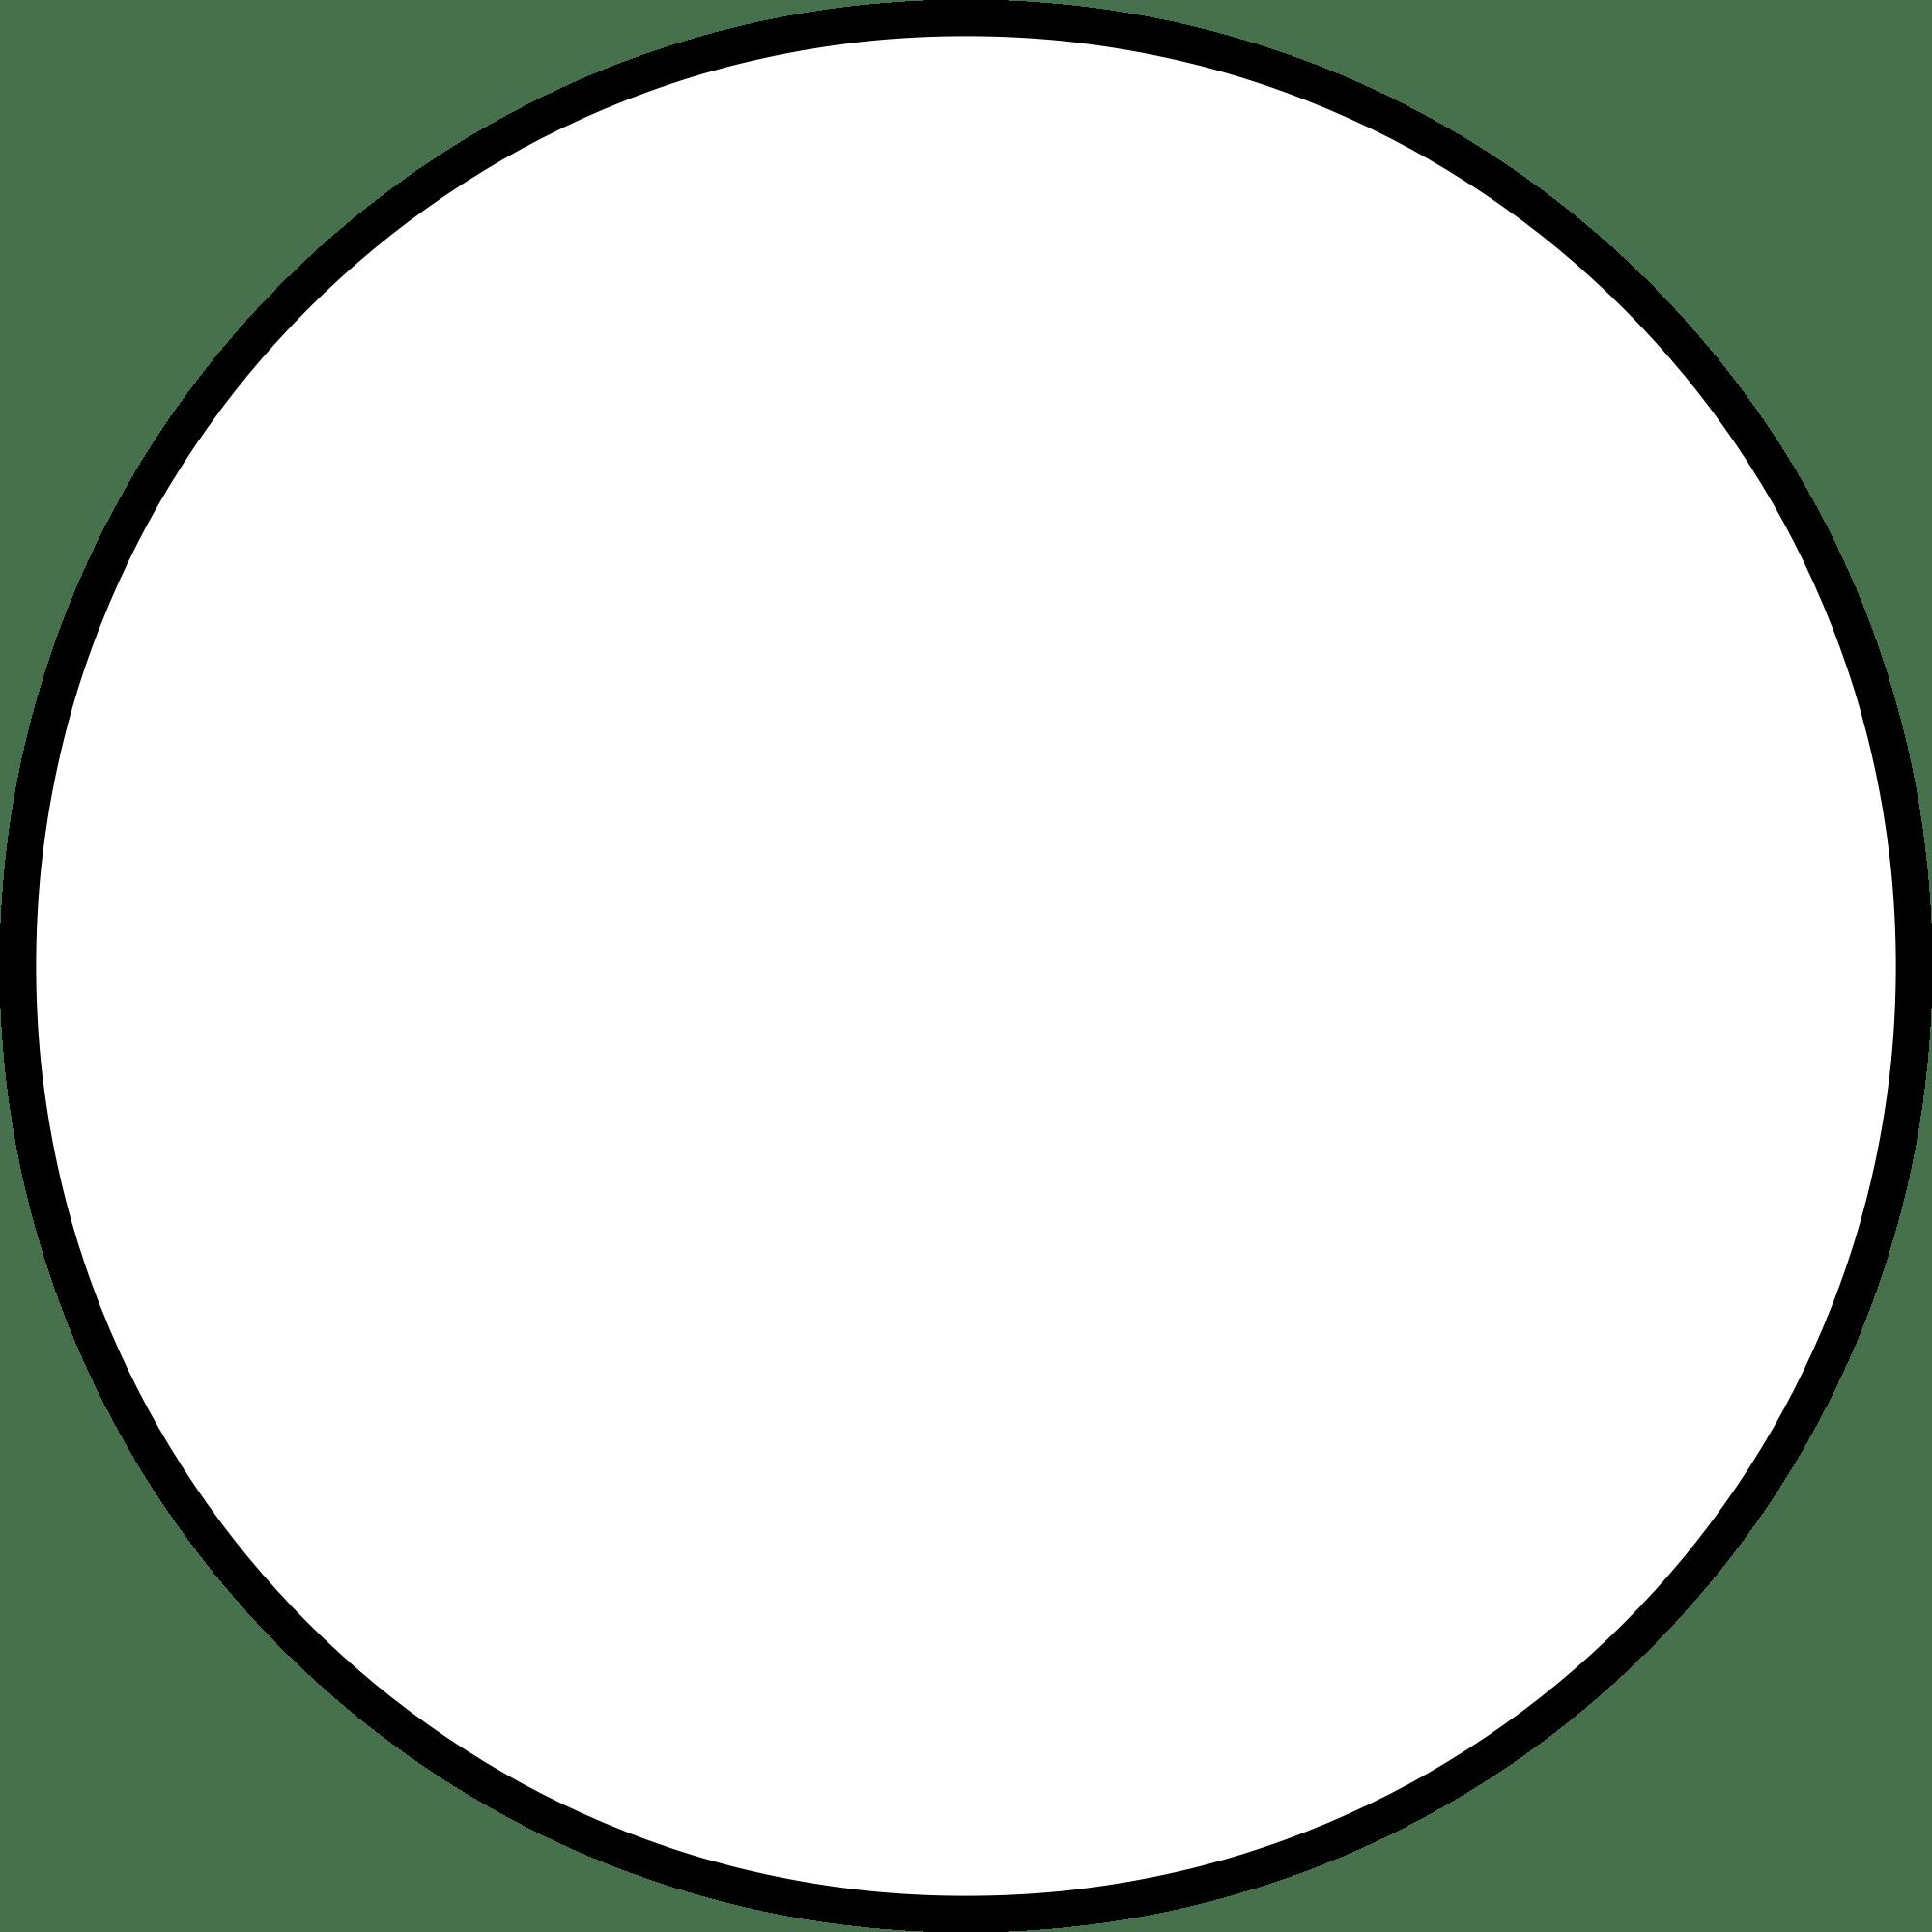 Circle Tattoo